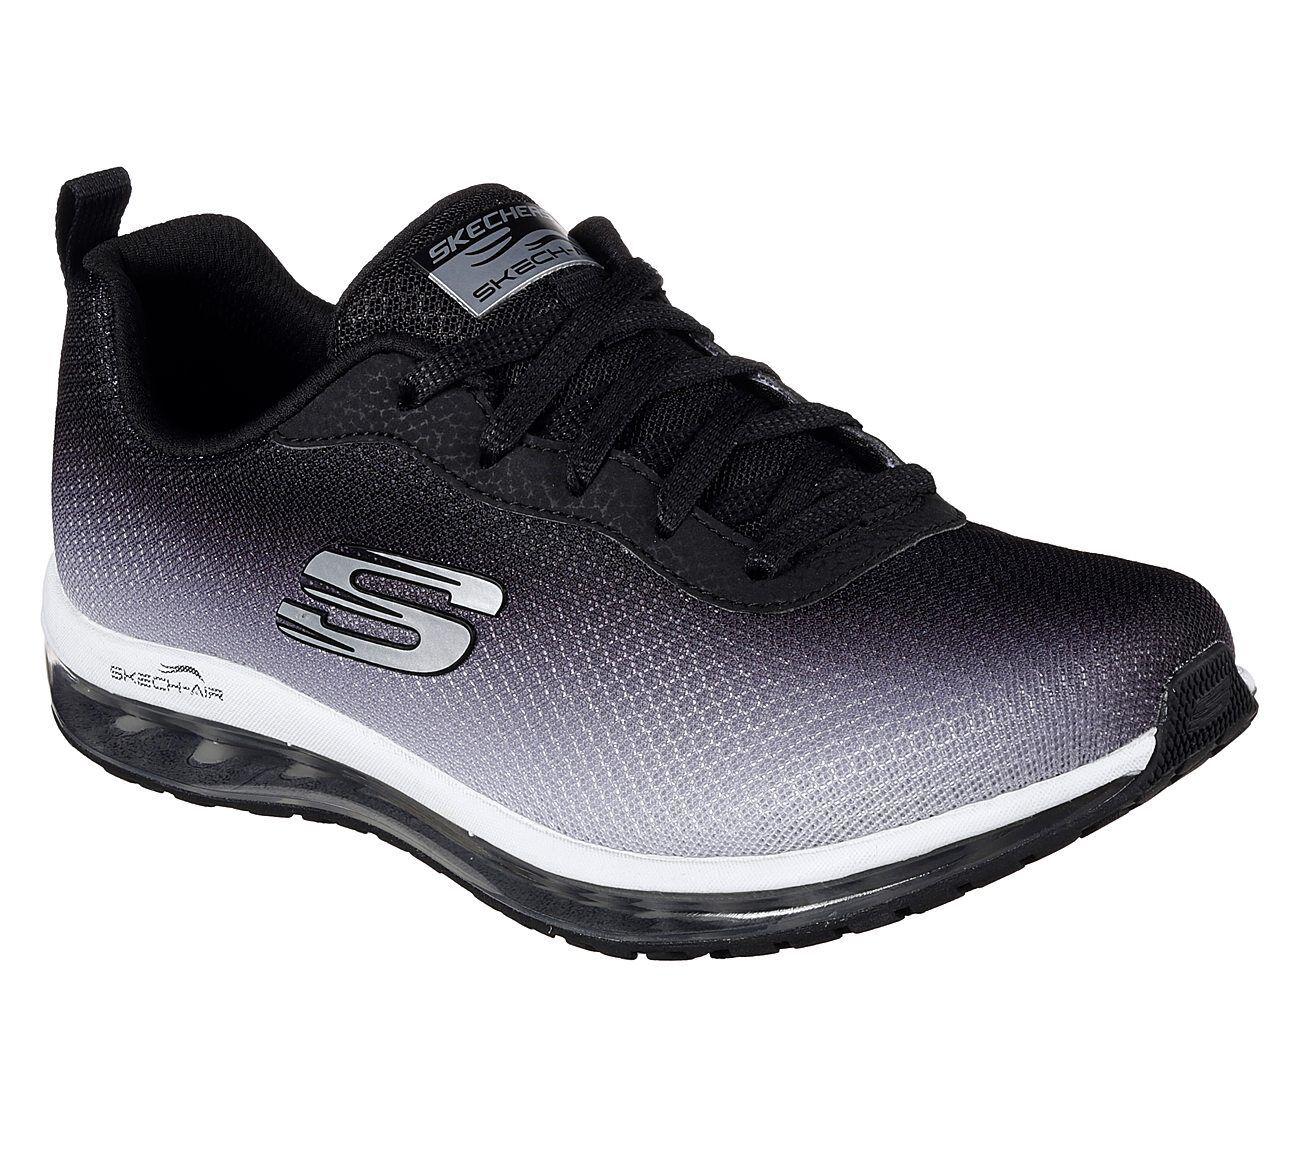 12640 Black Skechers shoes Memory Foam Women Sport Air Cushion Ombre Mesh Comfort